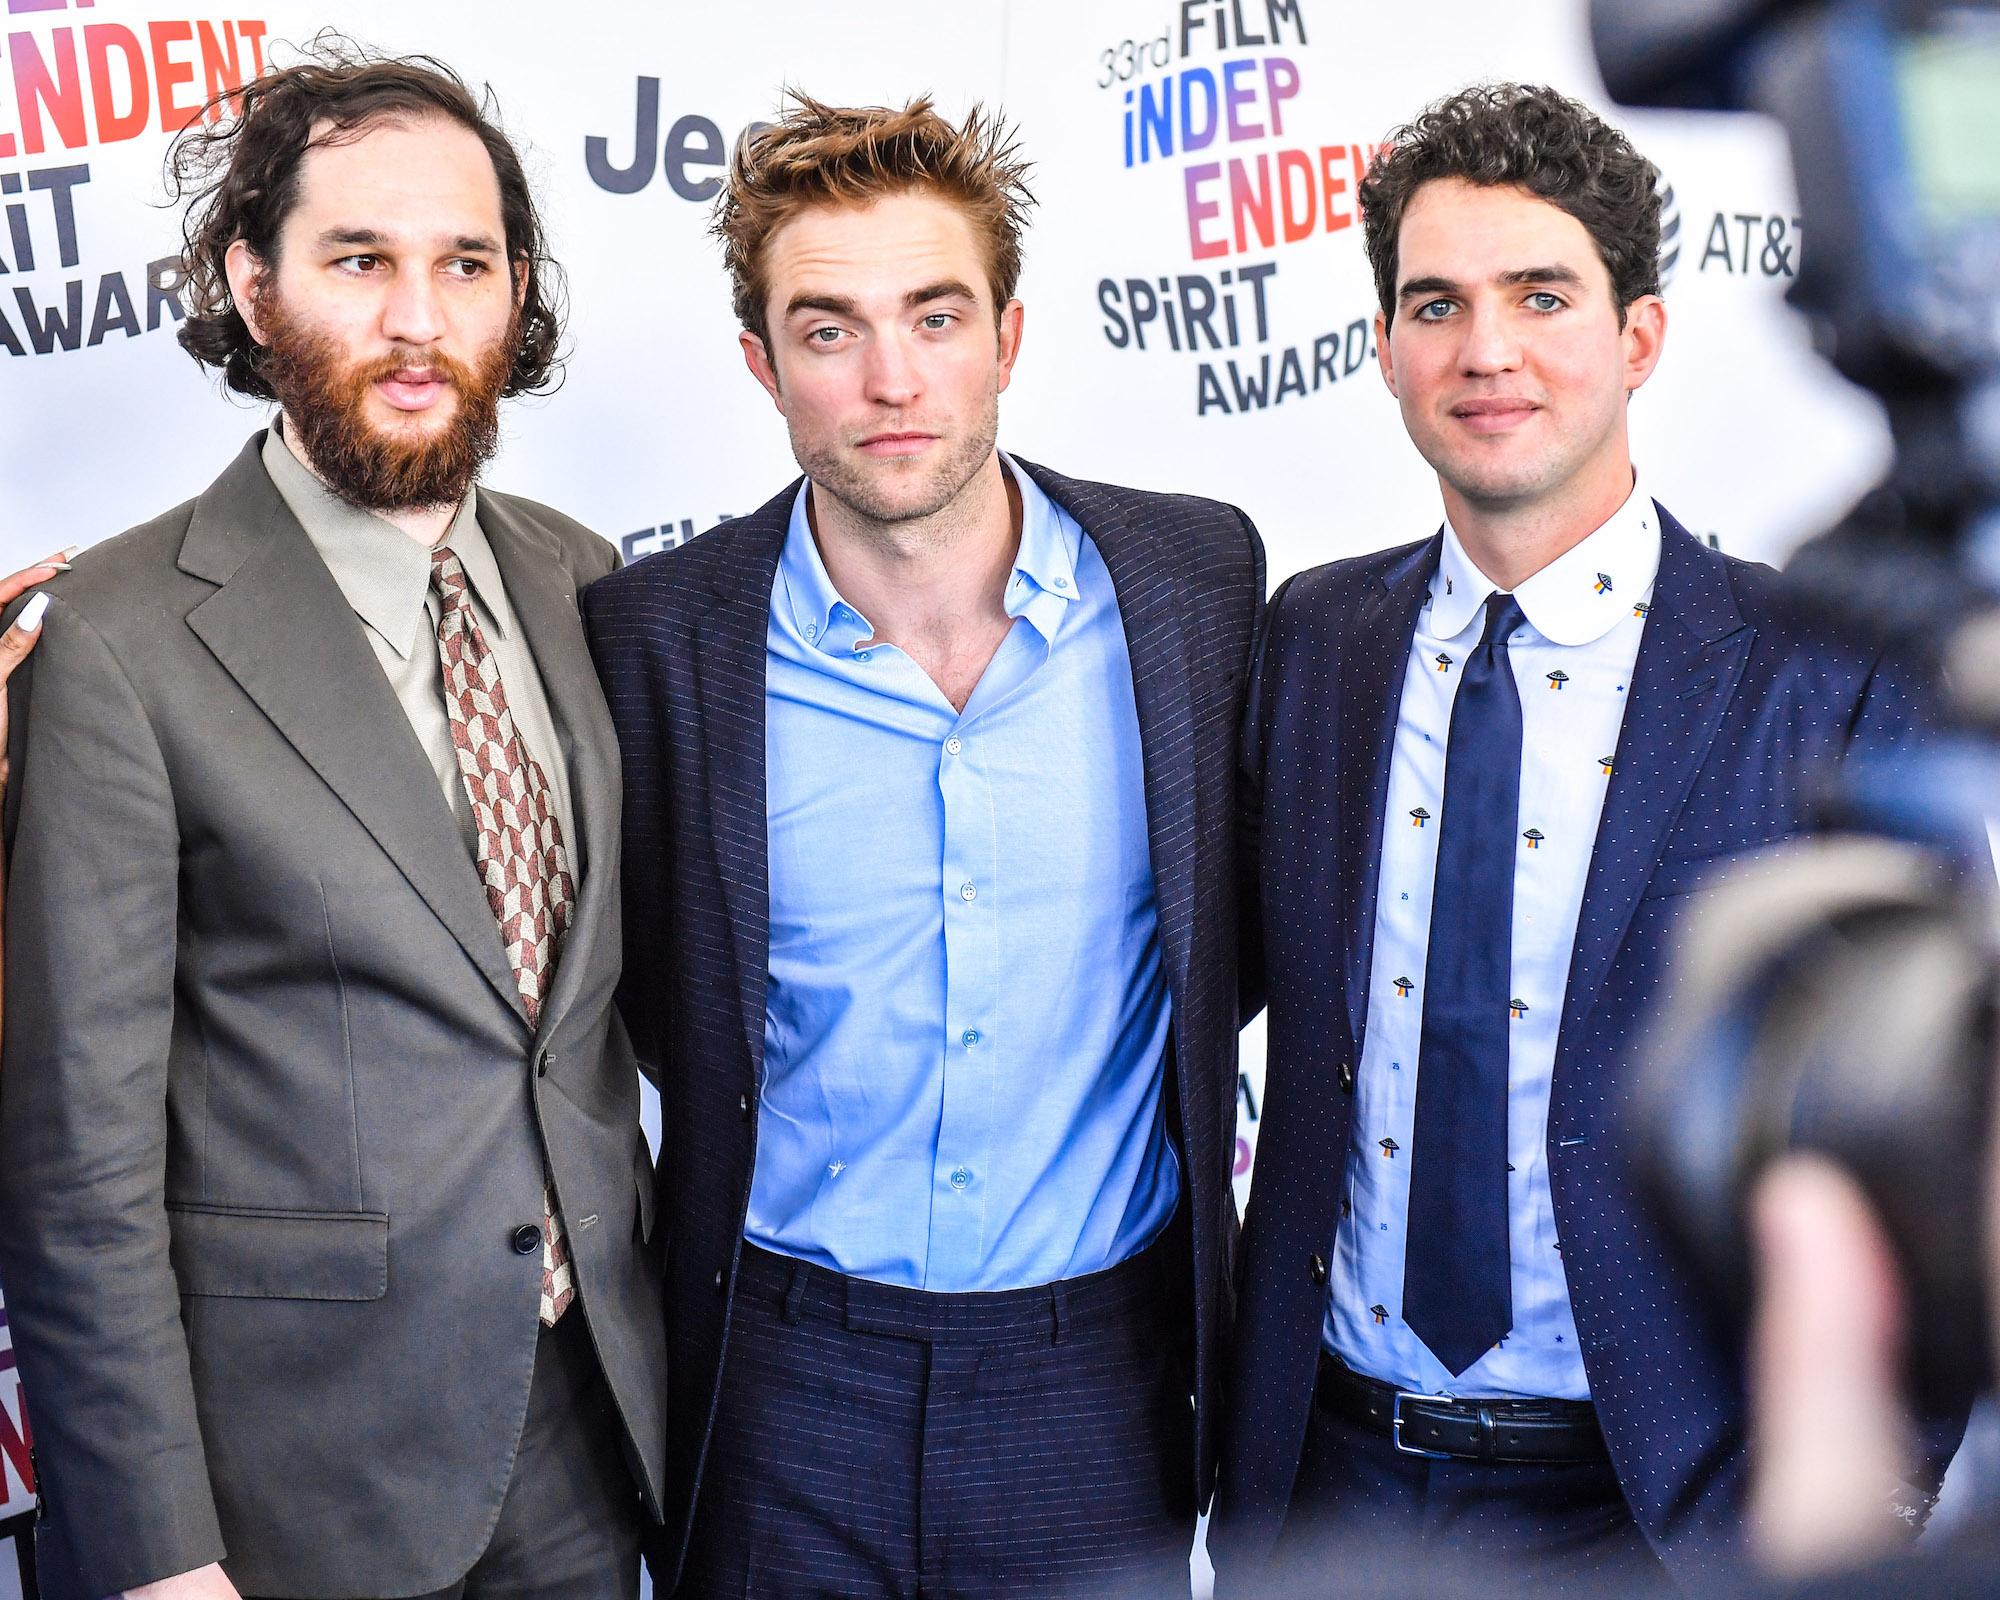 Josh Safdie, Robert Pattinson, and Benny Safdie at the 2018 Film Independent Spirit Awards on March 3, 2018